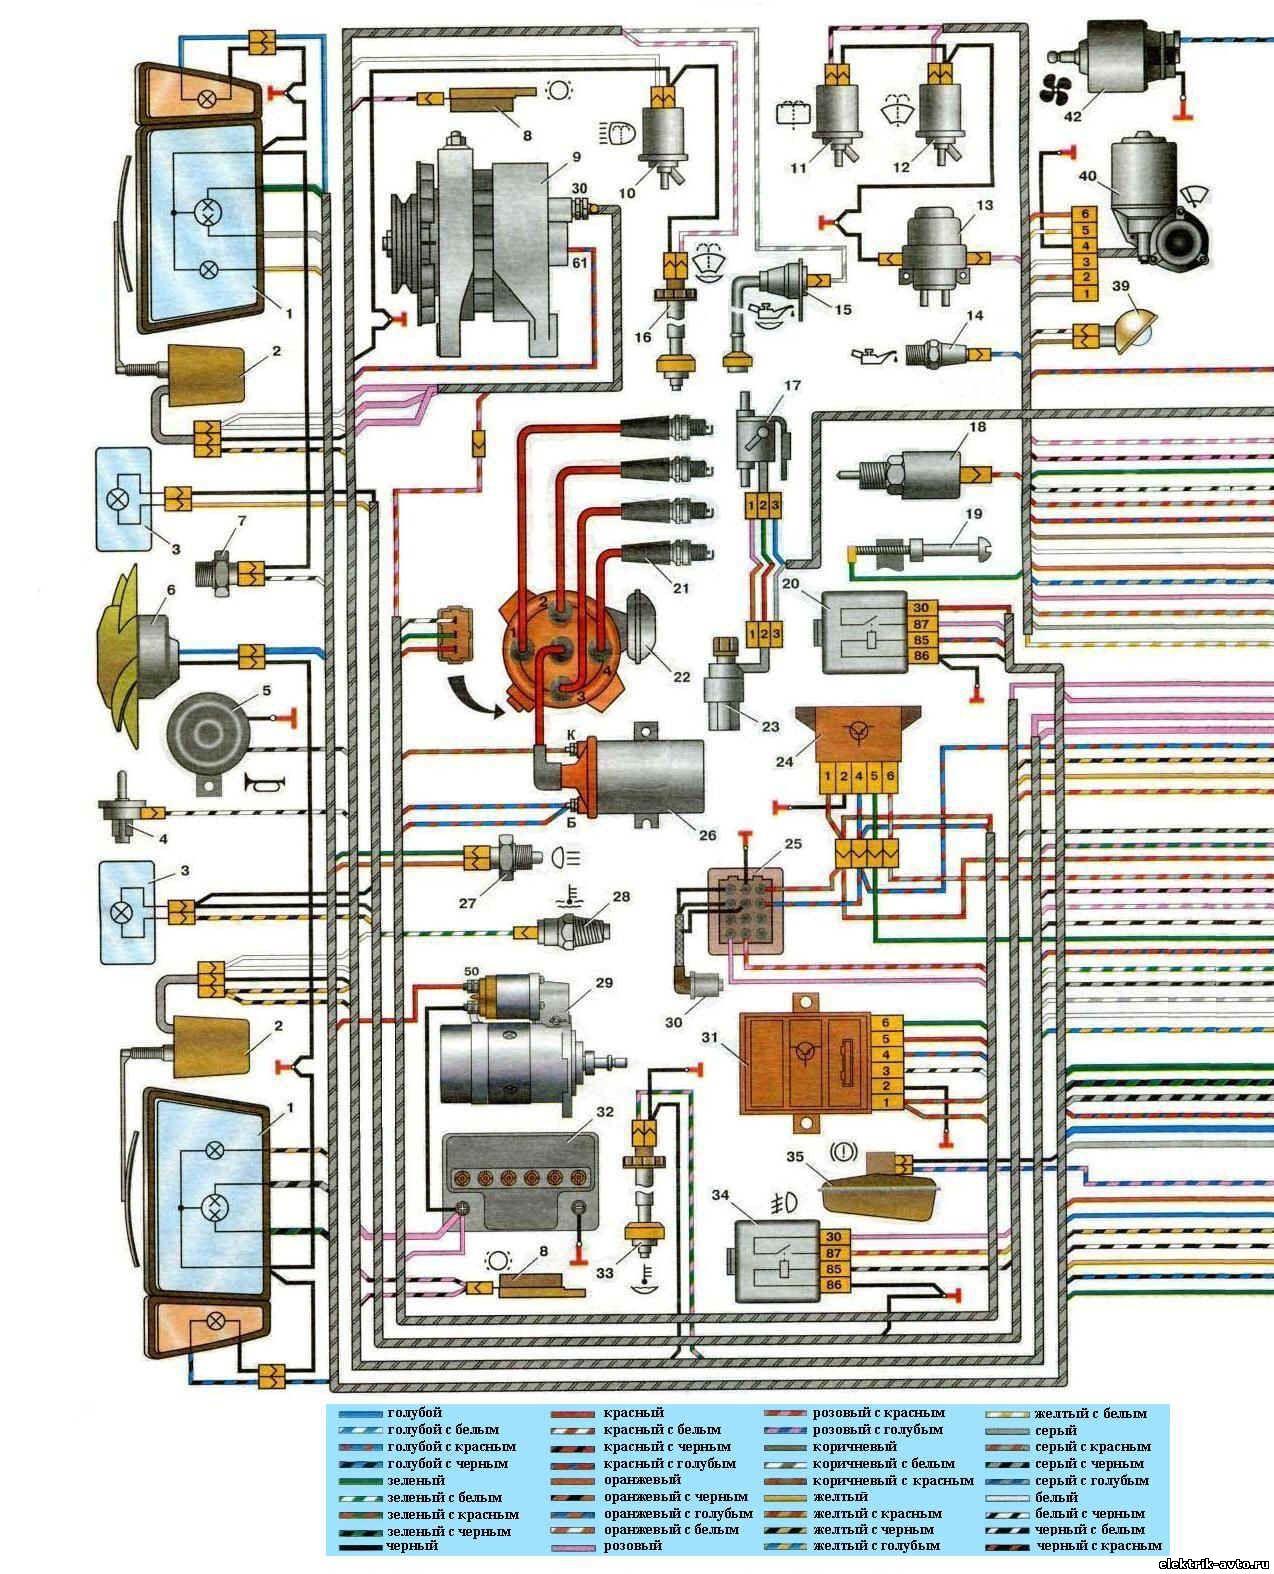 схема подключения огней стоп на ваз21093